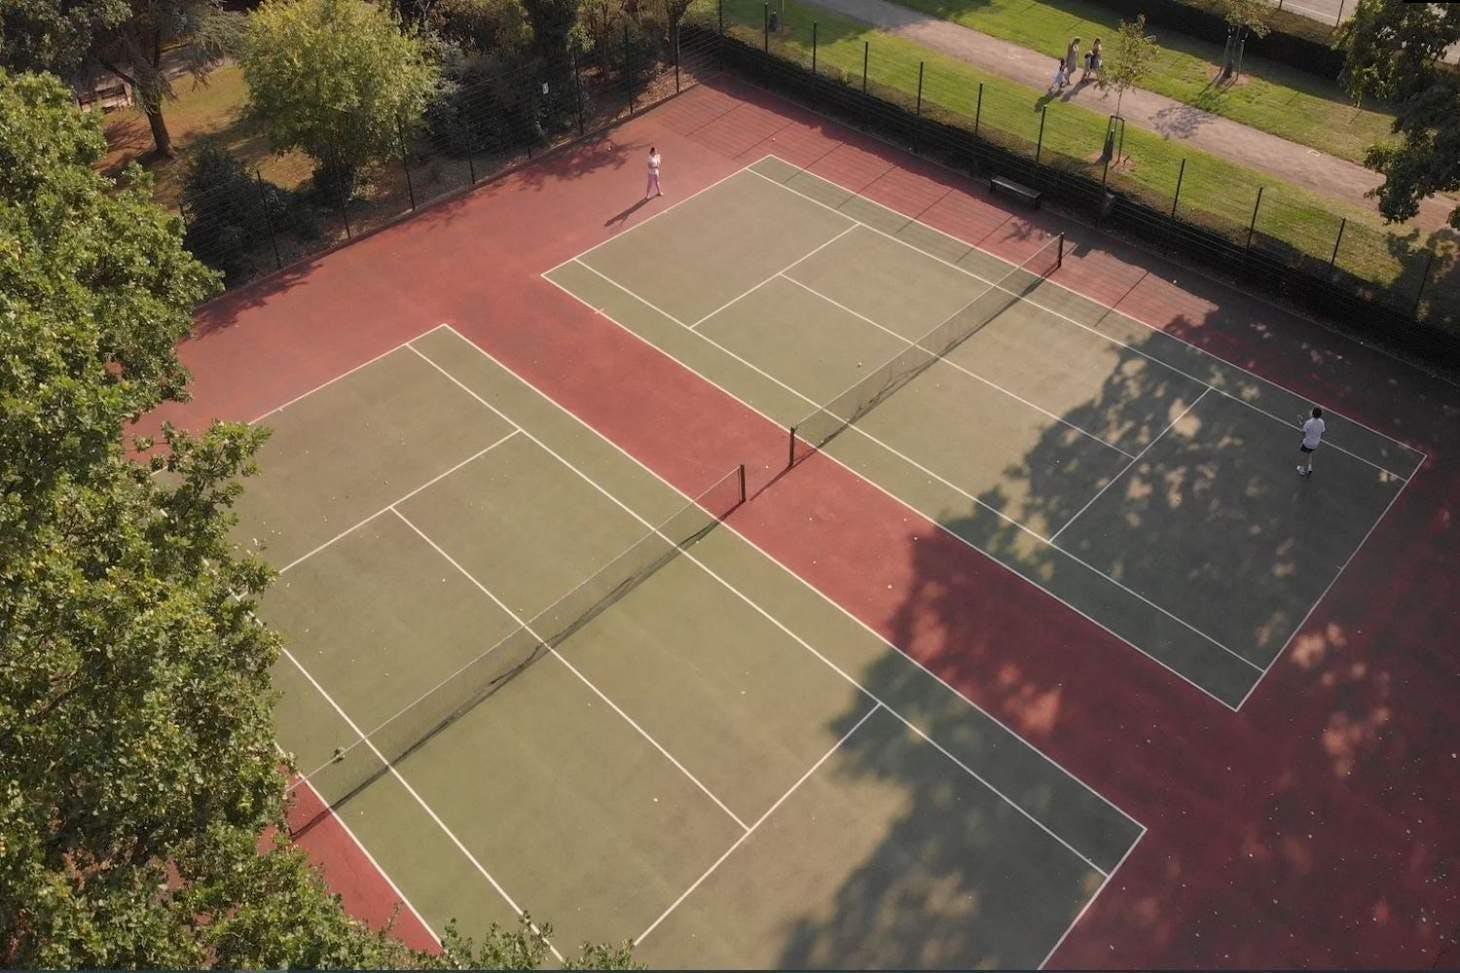 Edgwarebury Park Outdoor | Hard (macadam) tennis court